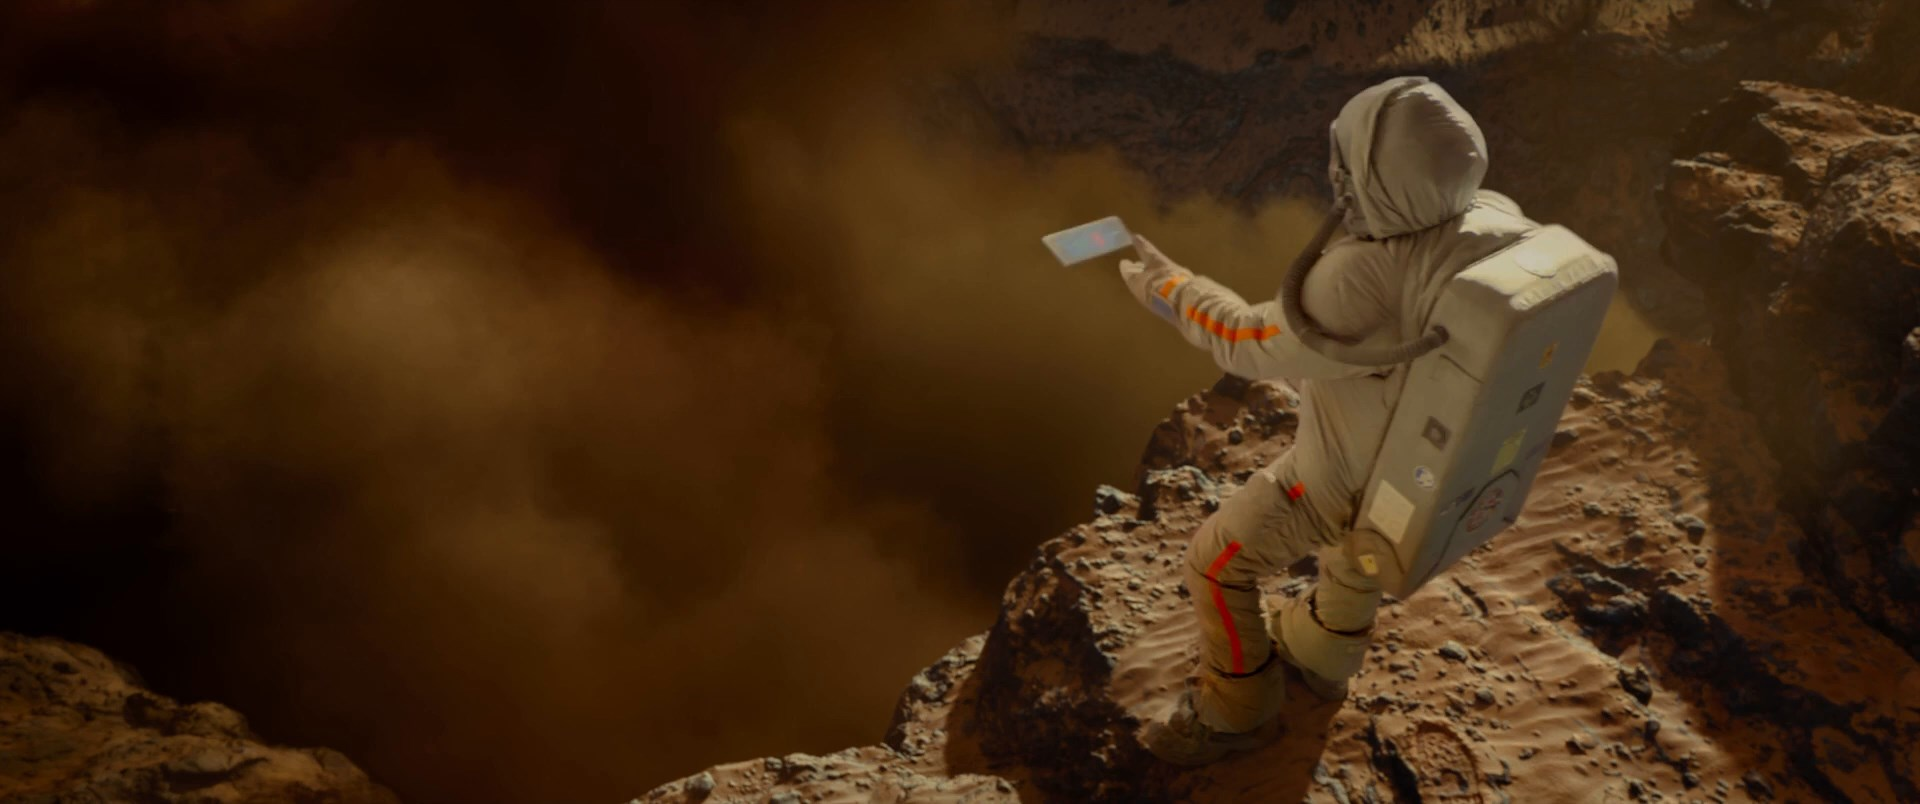 Rescate en Marte (2017) 1080p WEB-DL